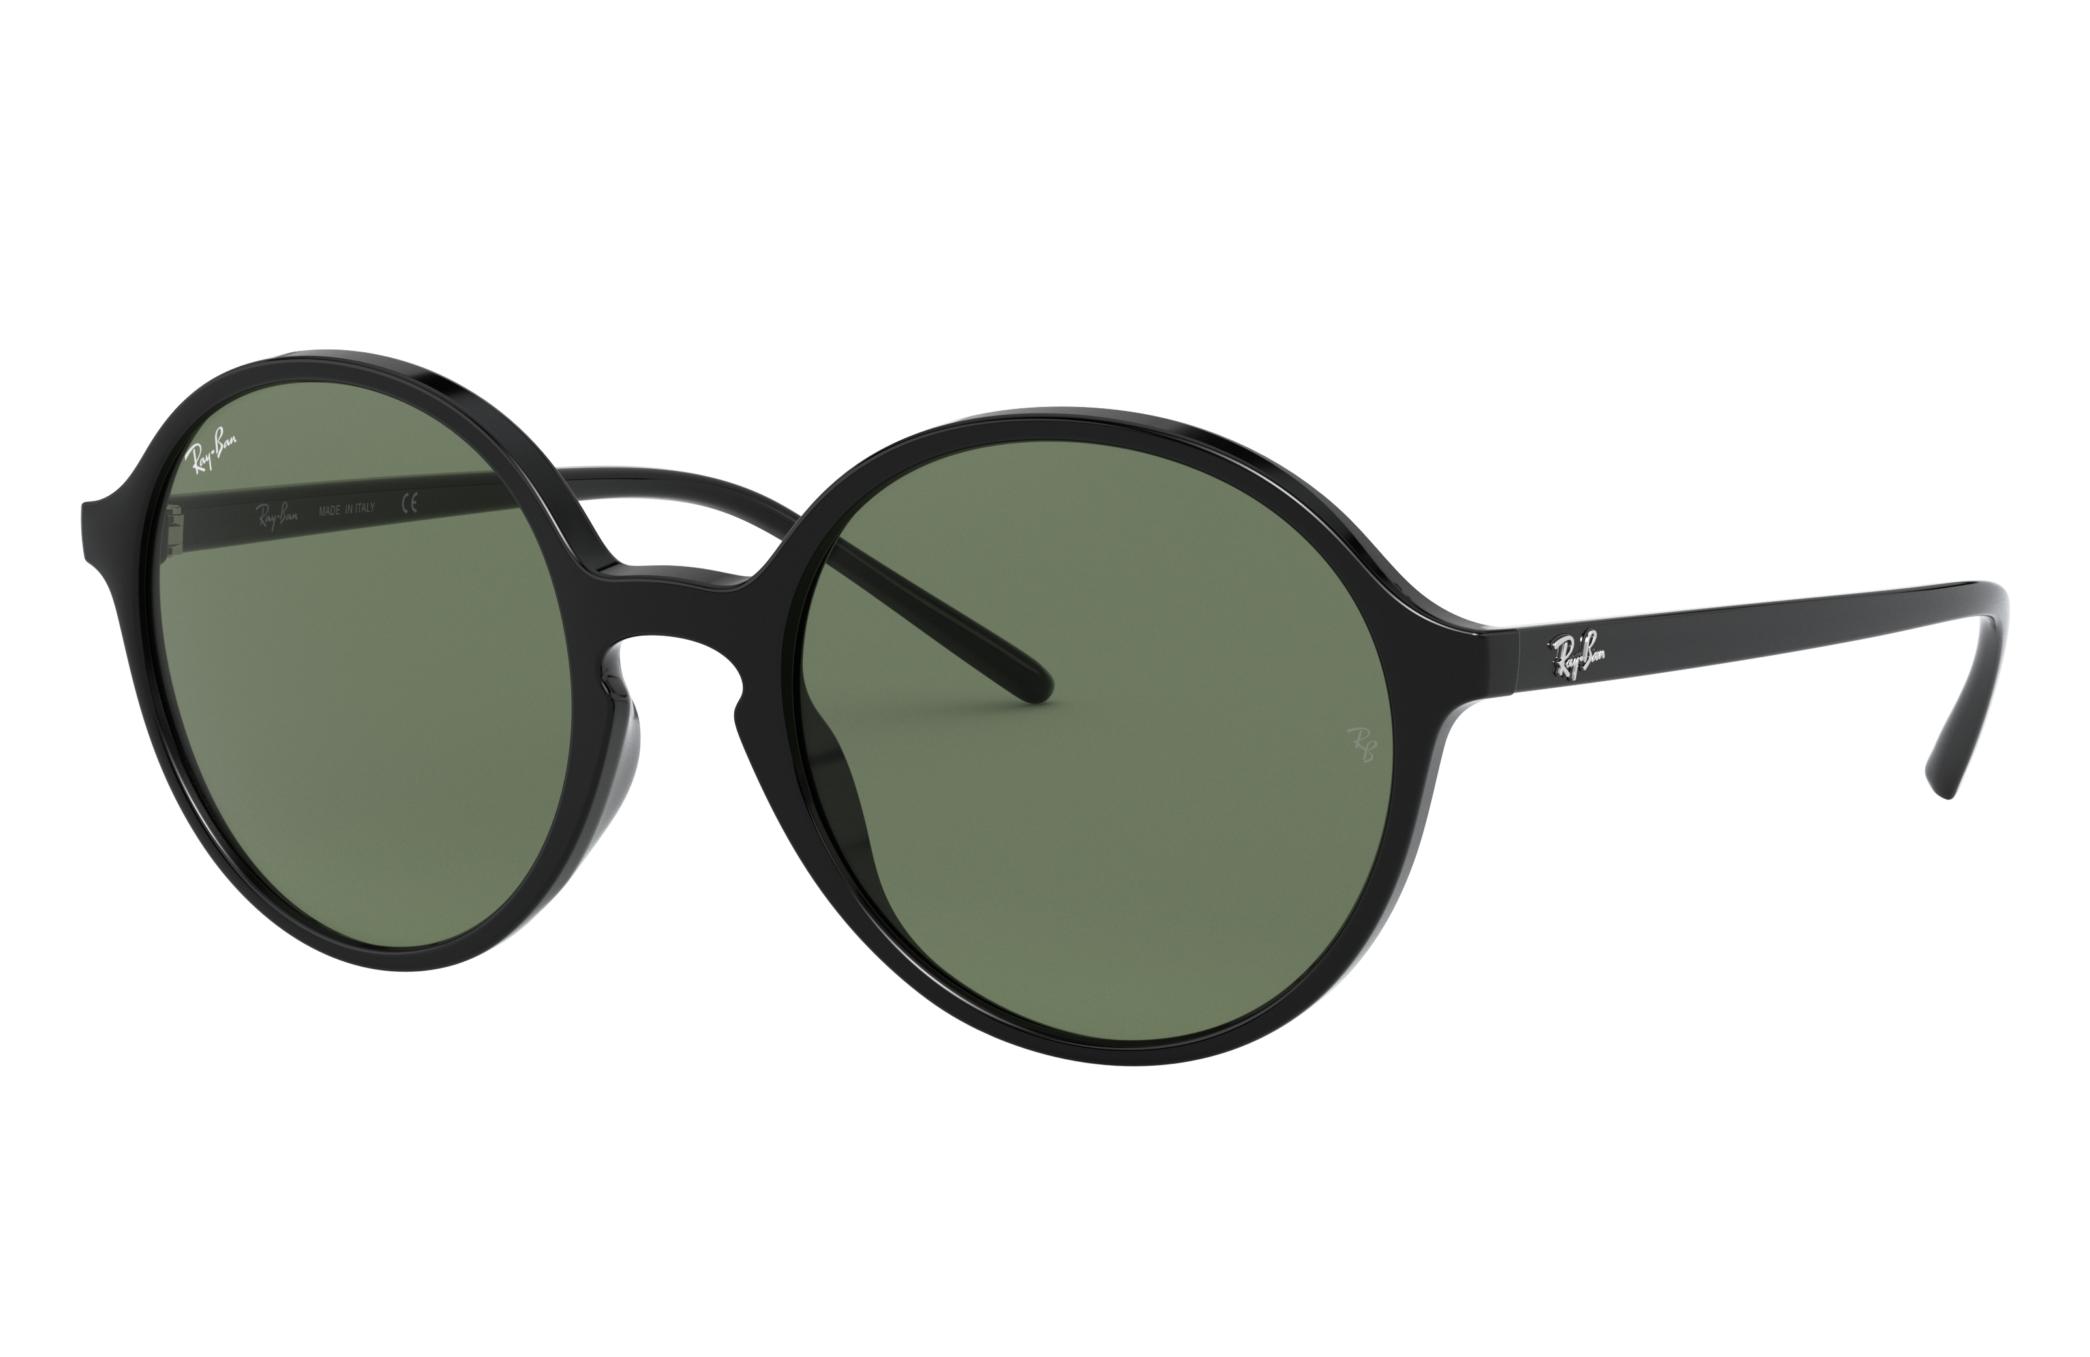 Ray-Ban Rb4304 Black, Green Lenses - RB4304